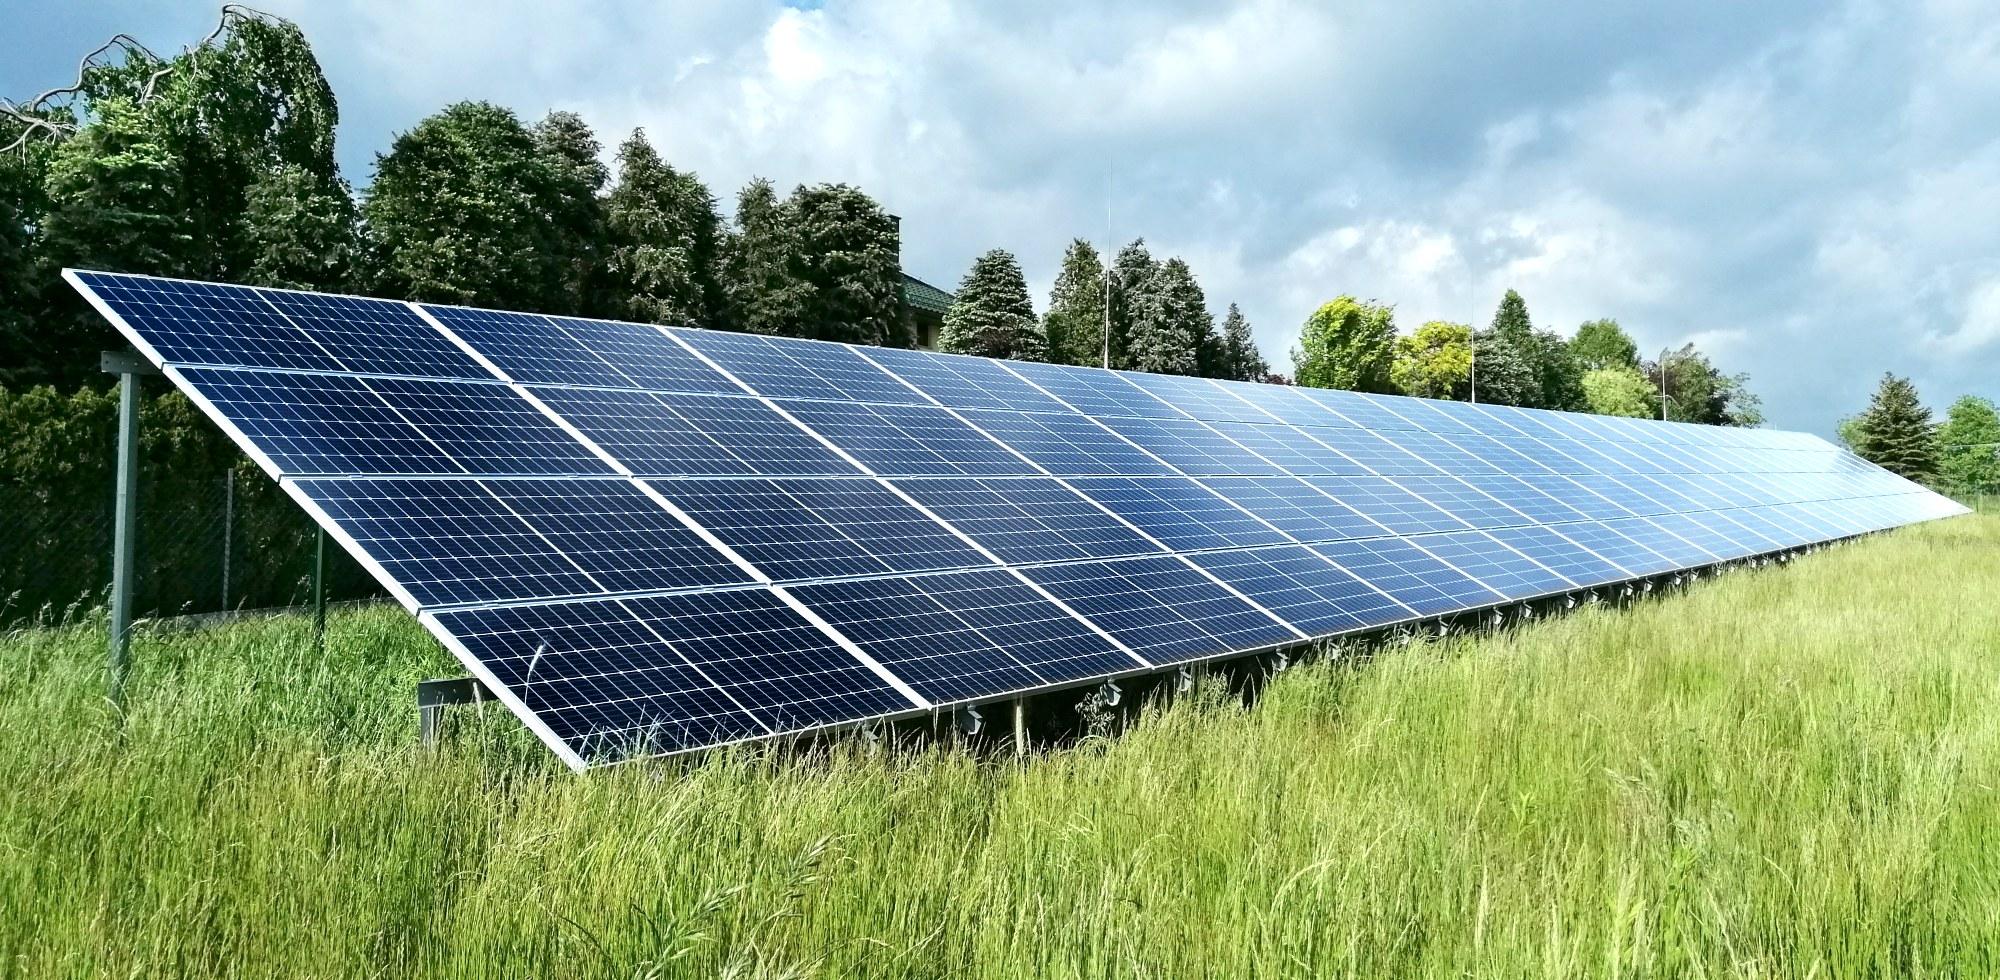 Polska Energia fotowoltaika Instalacja gruntowa dwupodporowa 30kWp